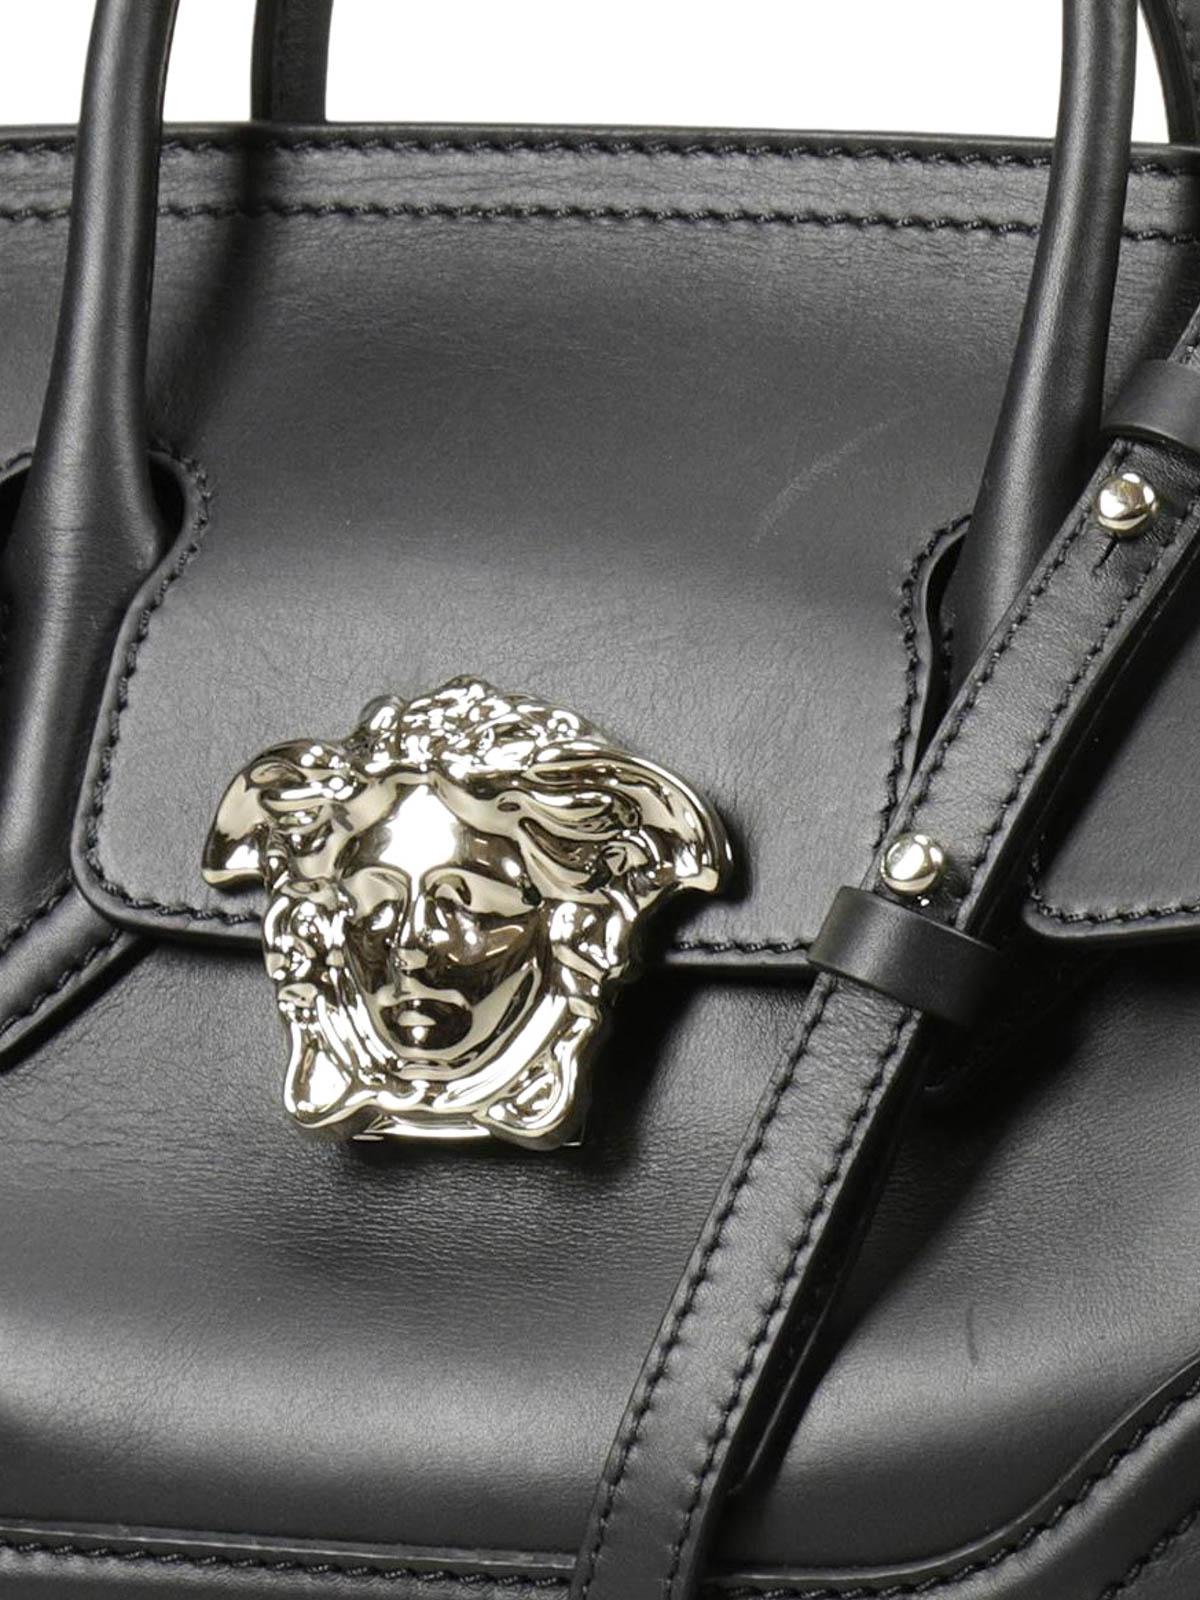 Versace - Palazzo Empire leather tote - totes bags - DBFF452 DSTVT 7b8b281cf436f